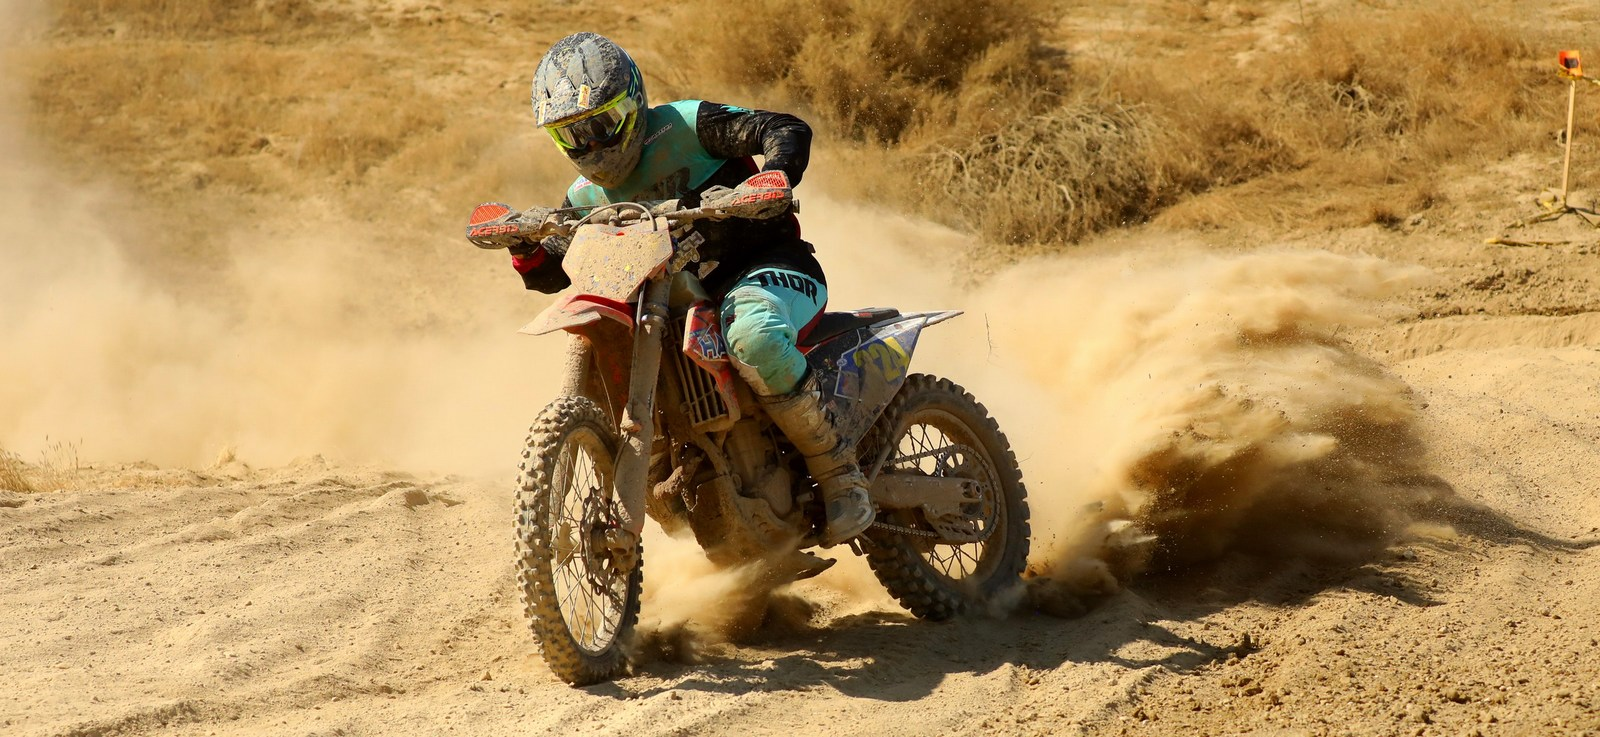 2019-10-gary-sutherlin-bike-worcs-racing